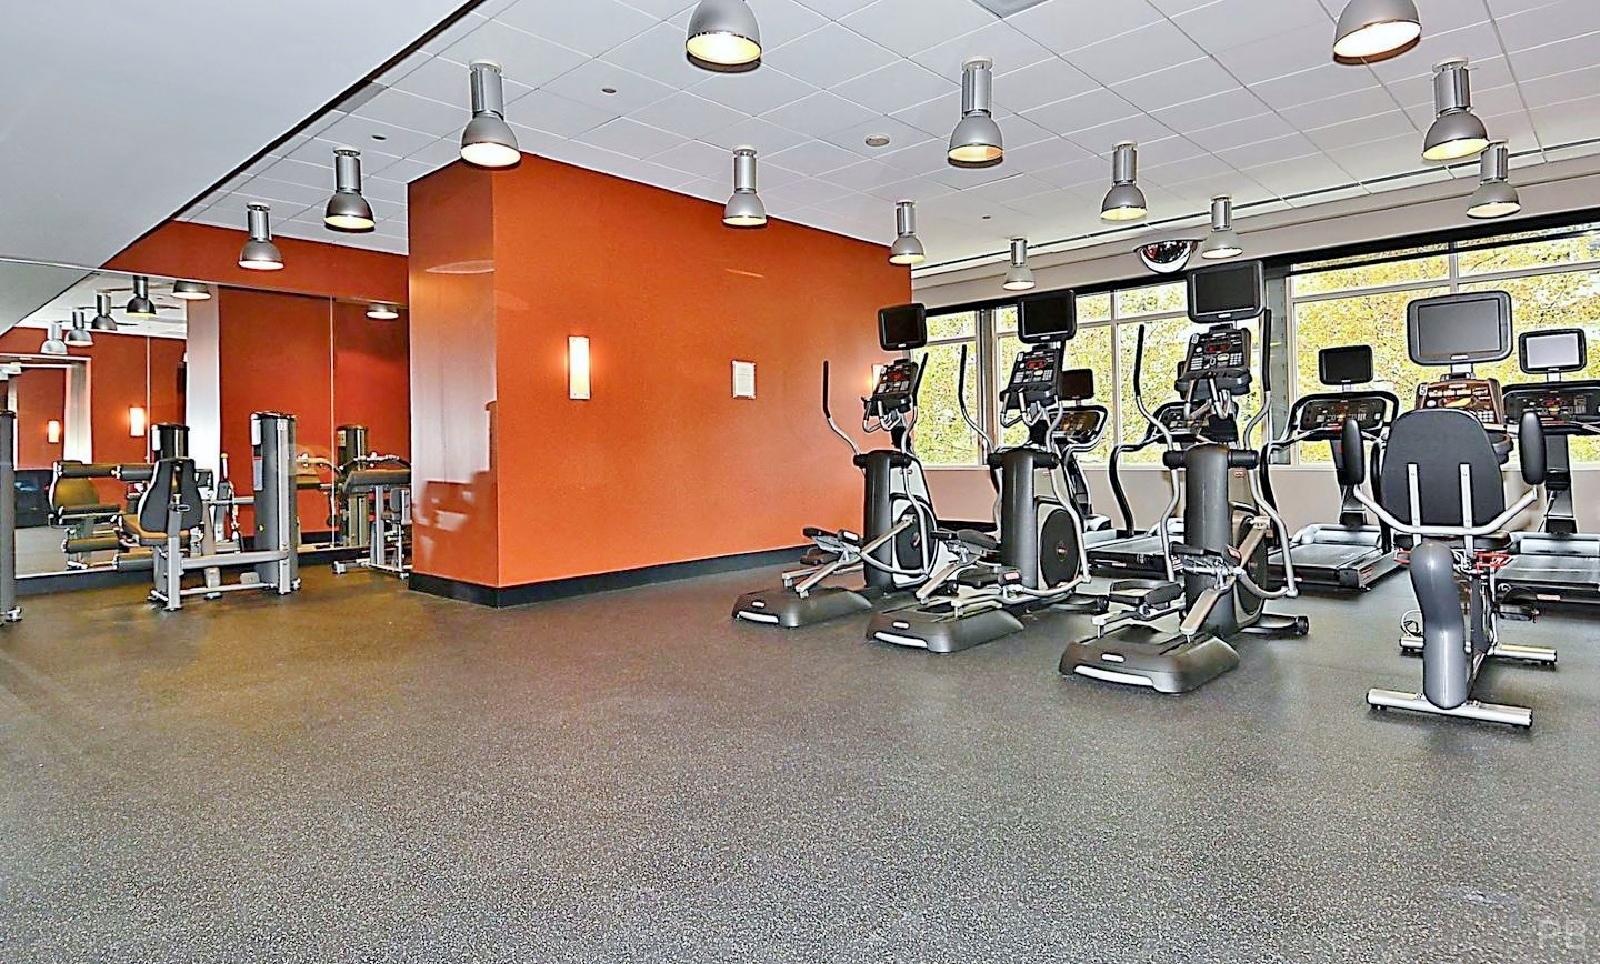 One National Harbor Condo Fitness Center